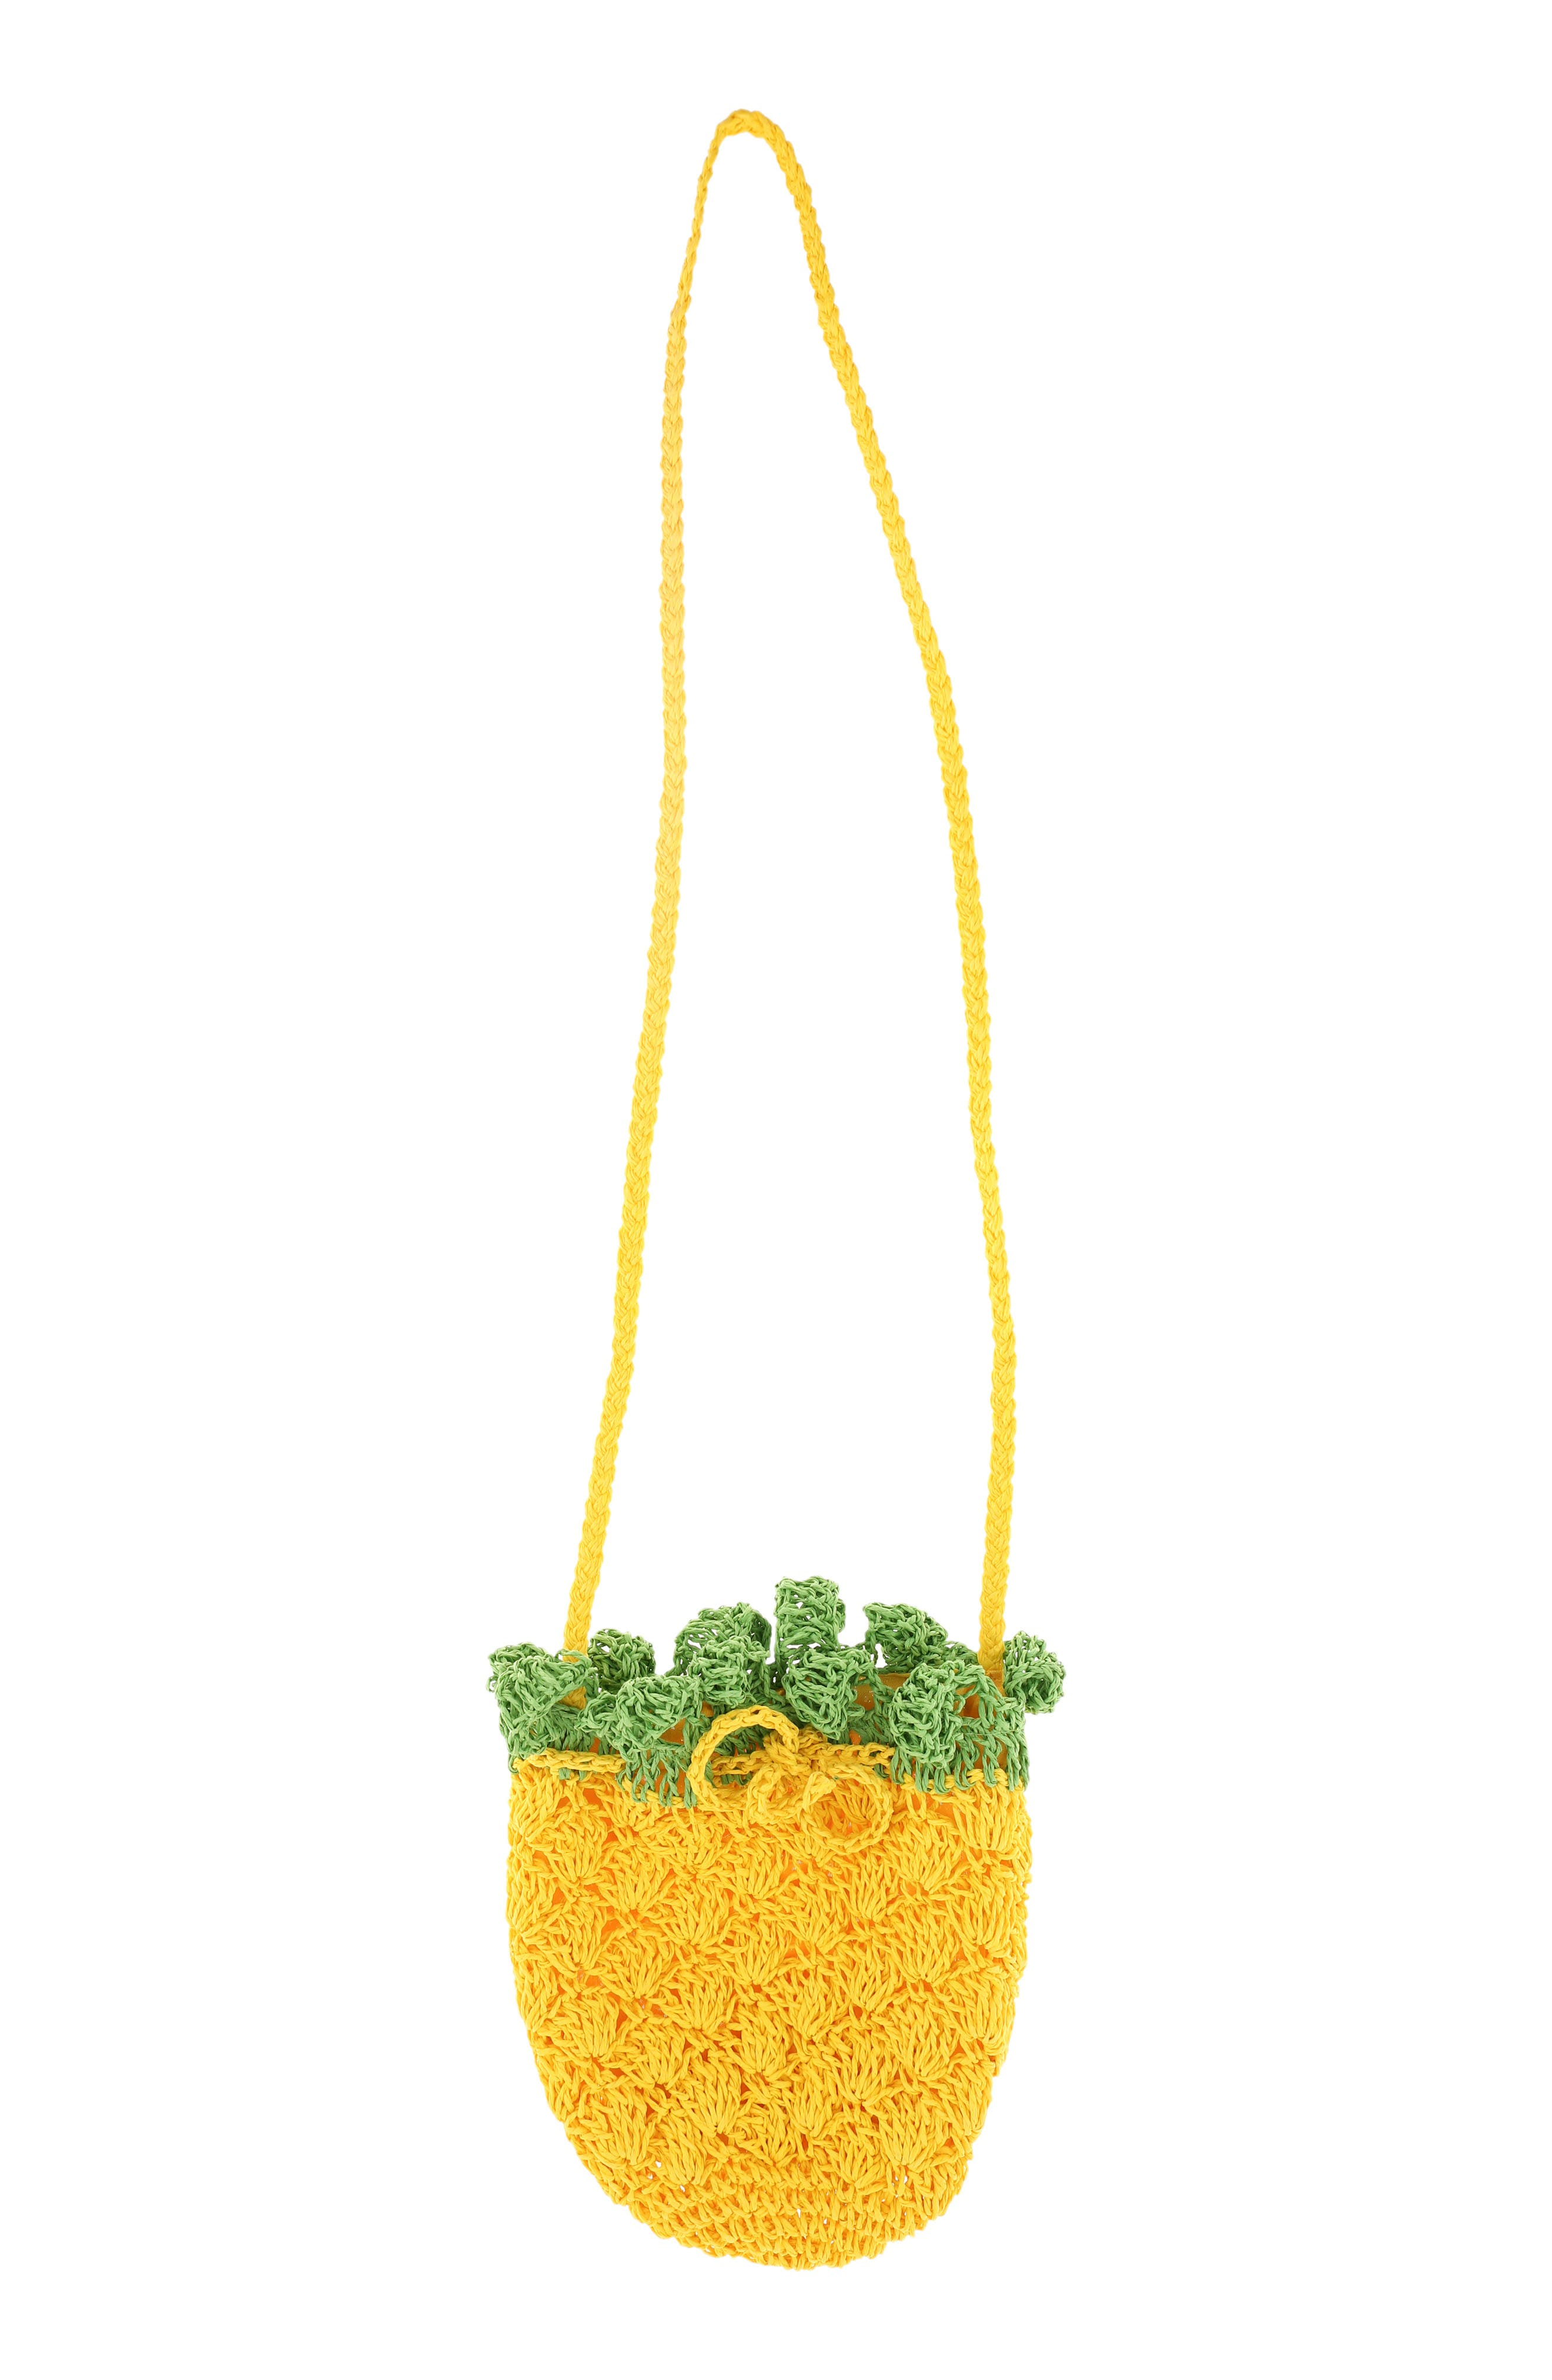 Crochet Pineapple Crossbody Bag,                             Alternate thumbnail 4, color,                             YELLOW COMBO